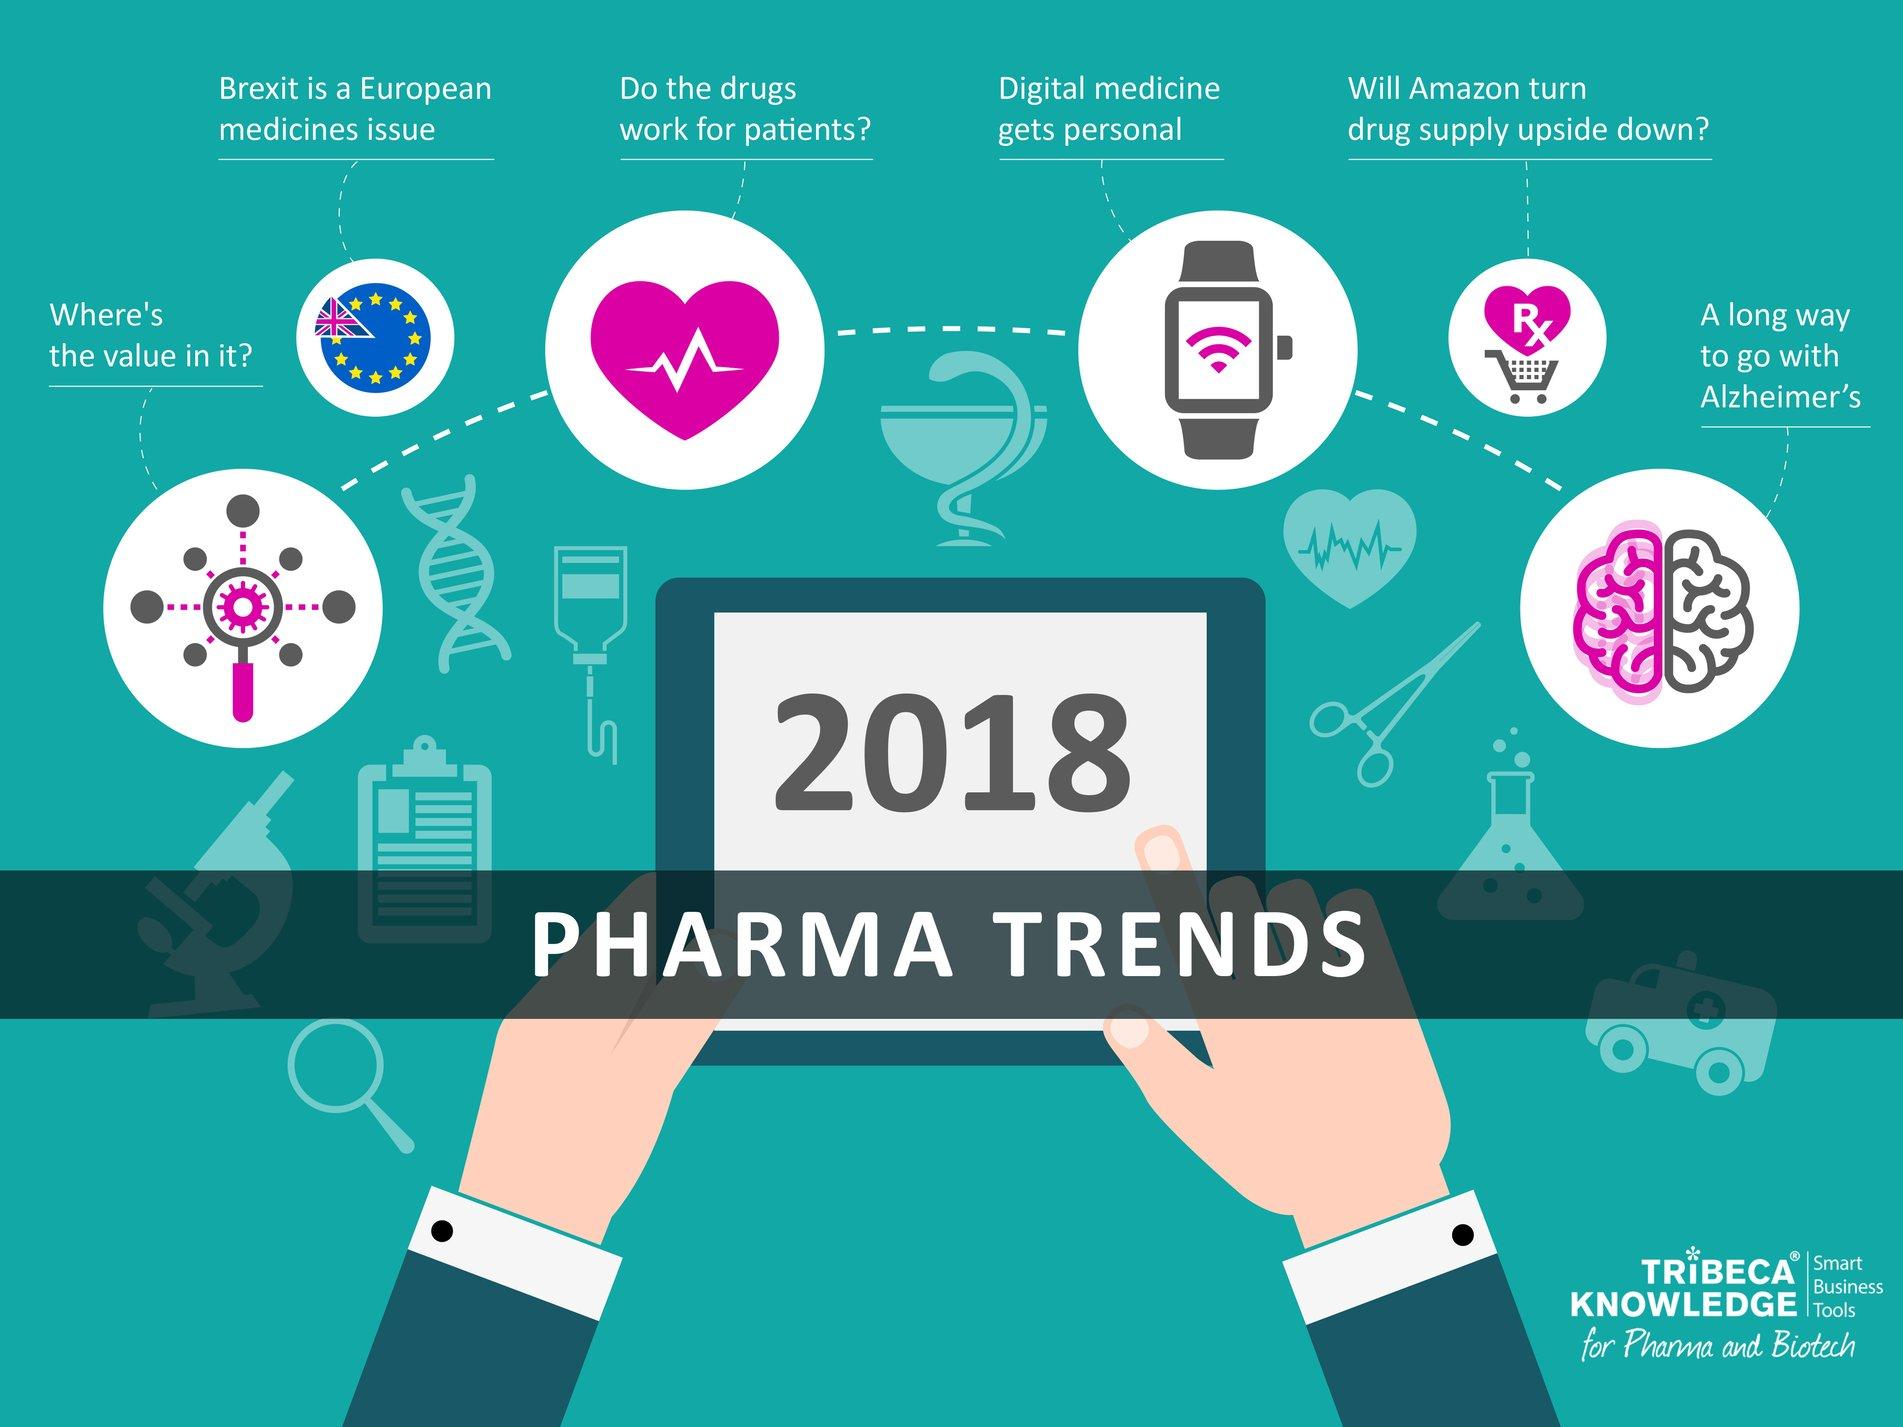 pharma_trends_illustration_version_04.jpg